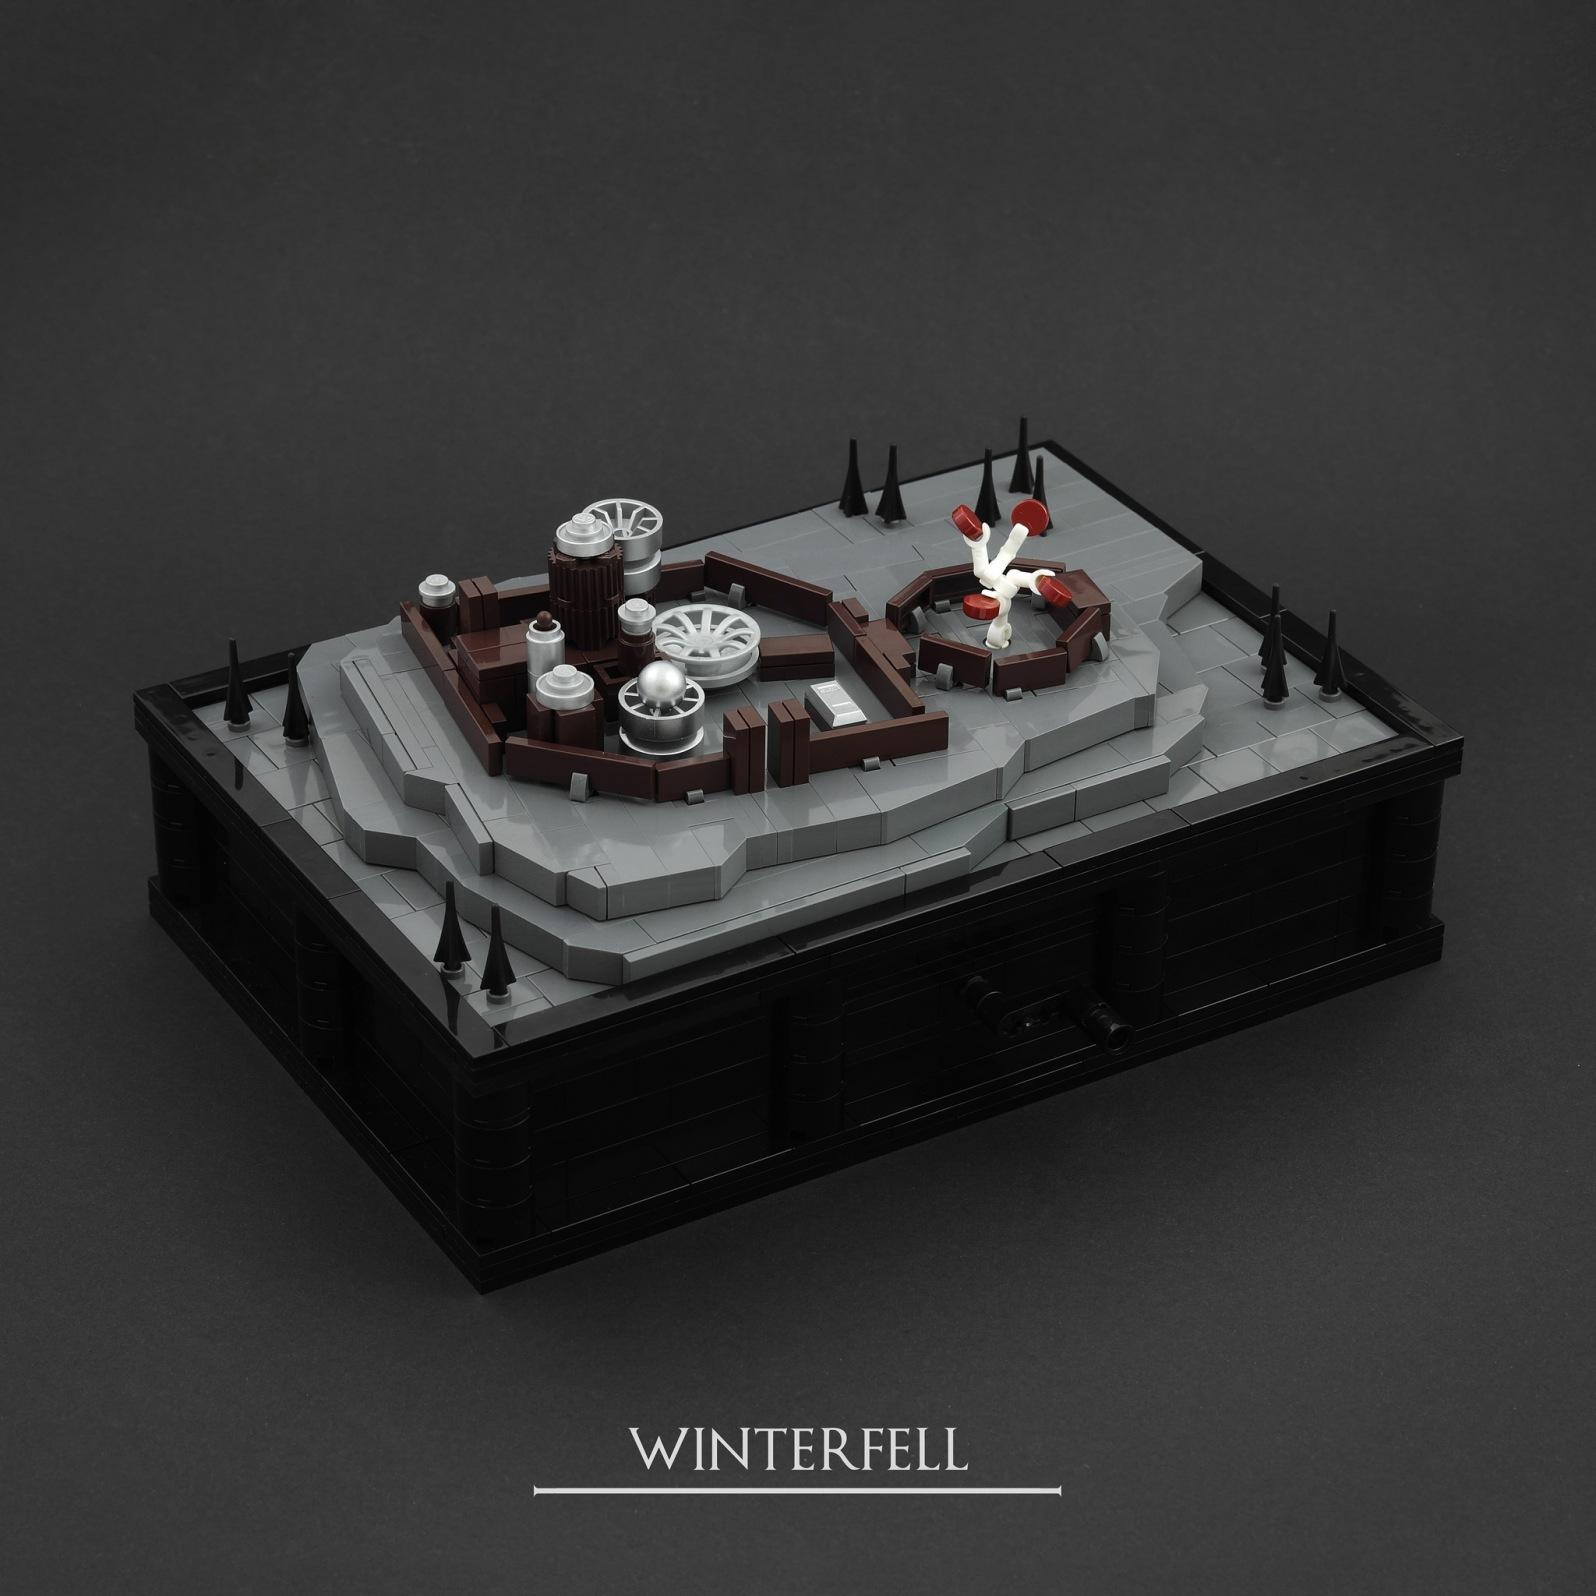 Jonas Kramm - LEGO: GoT - Winterfell